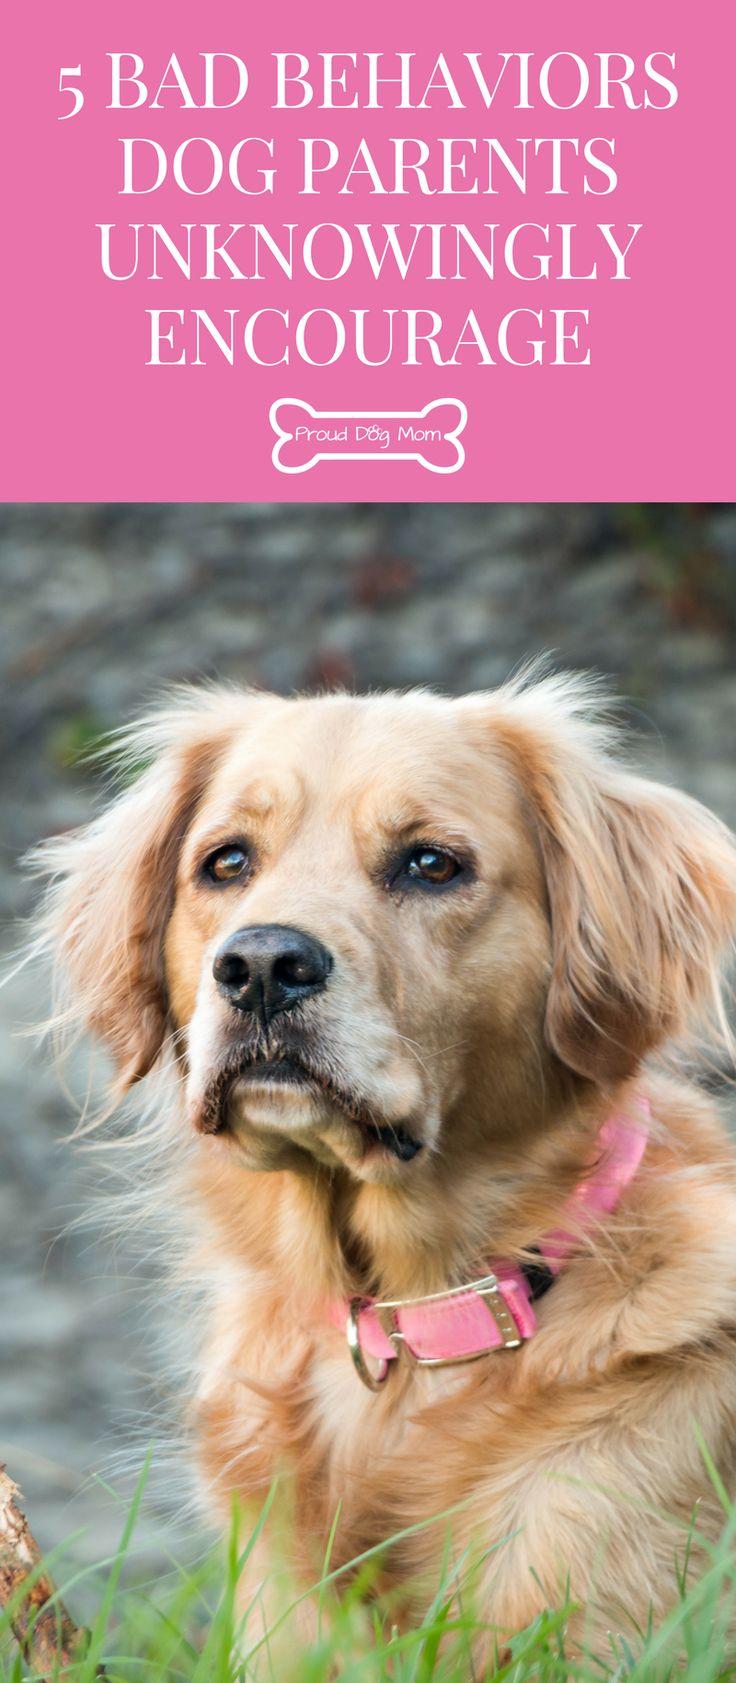 5 Bad Behaviors Dog Parents Unknowingly Encourage | Dog Behavior | Dog Training Tips |